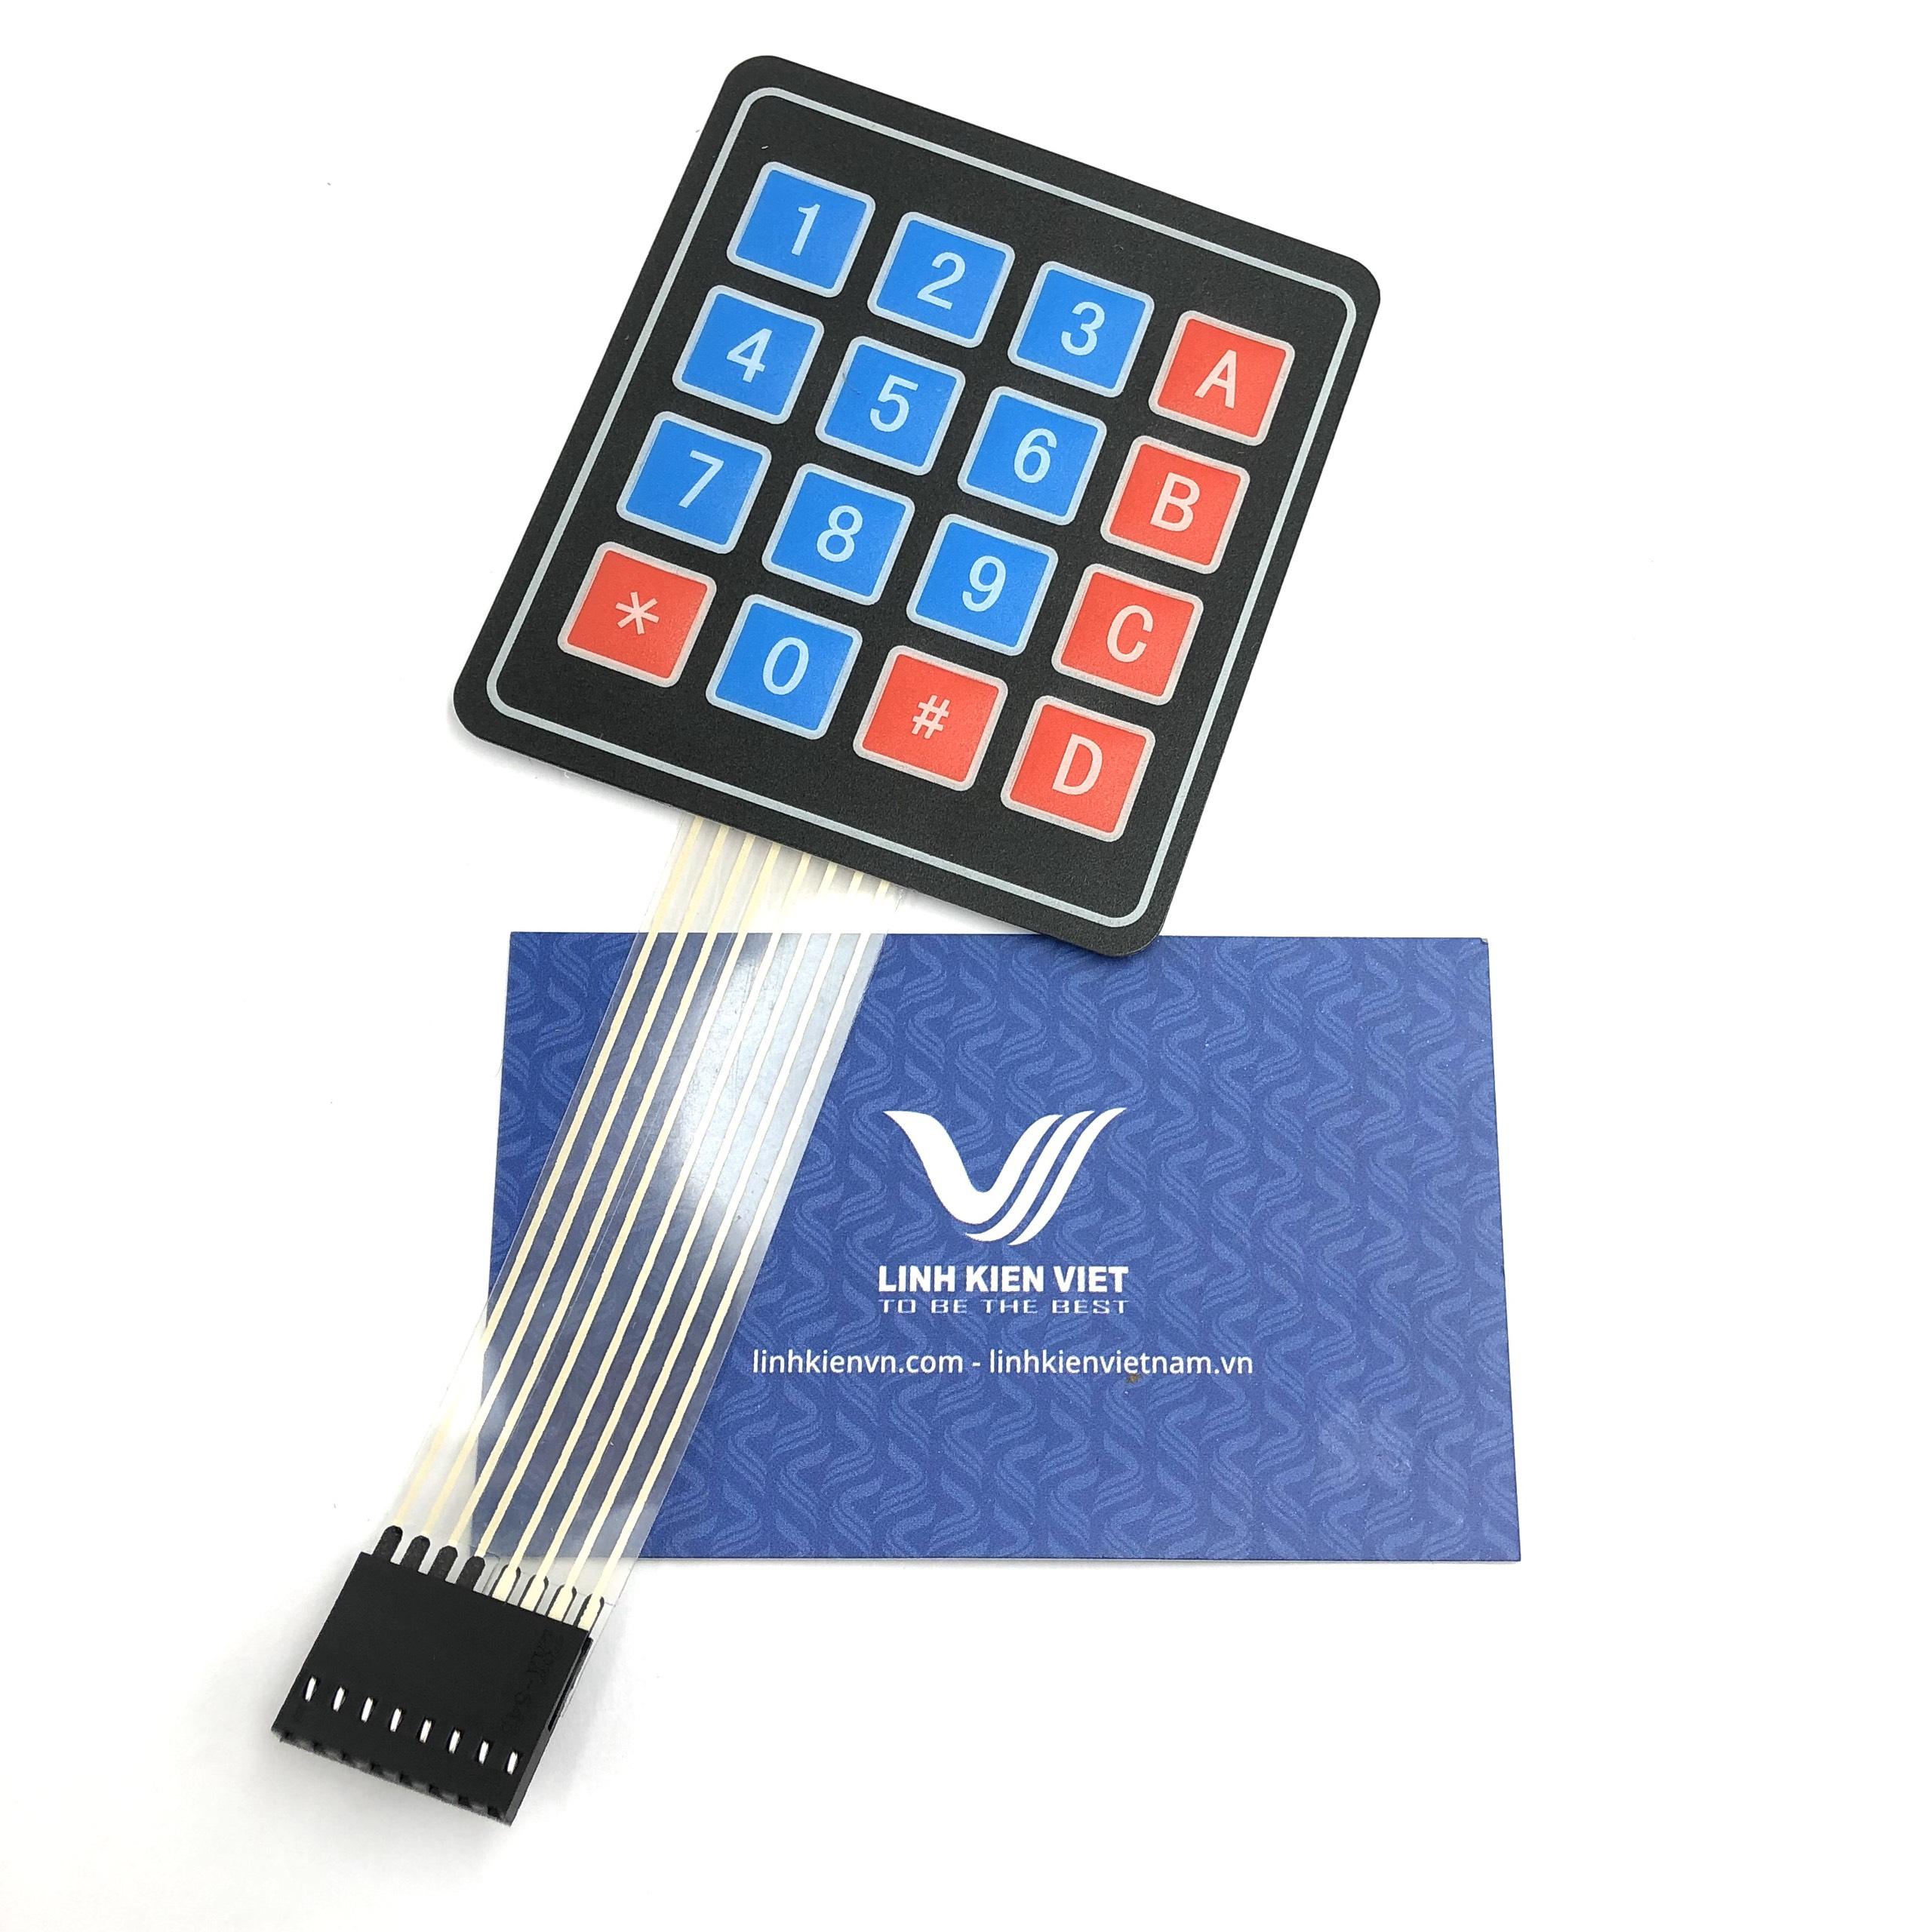 Bàn phím ma trận số 4x4 keypad  - i3H21